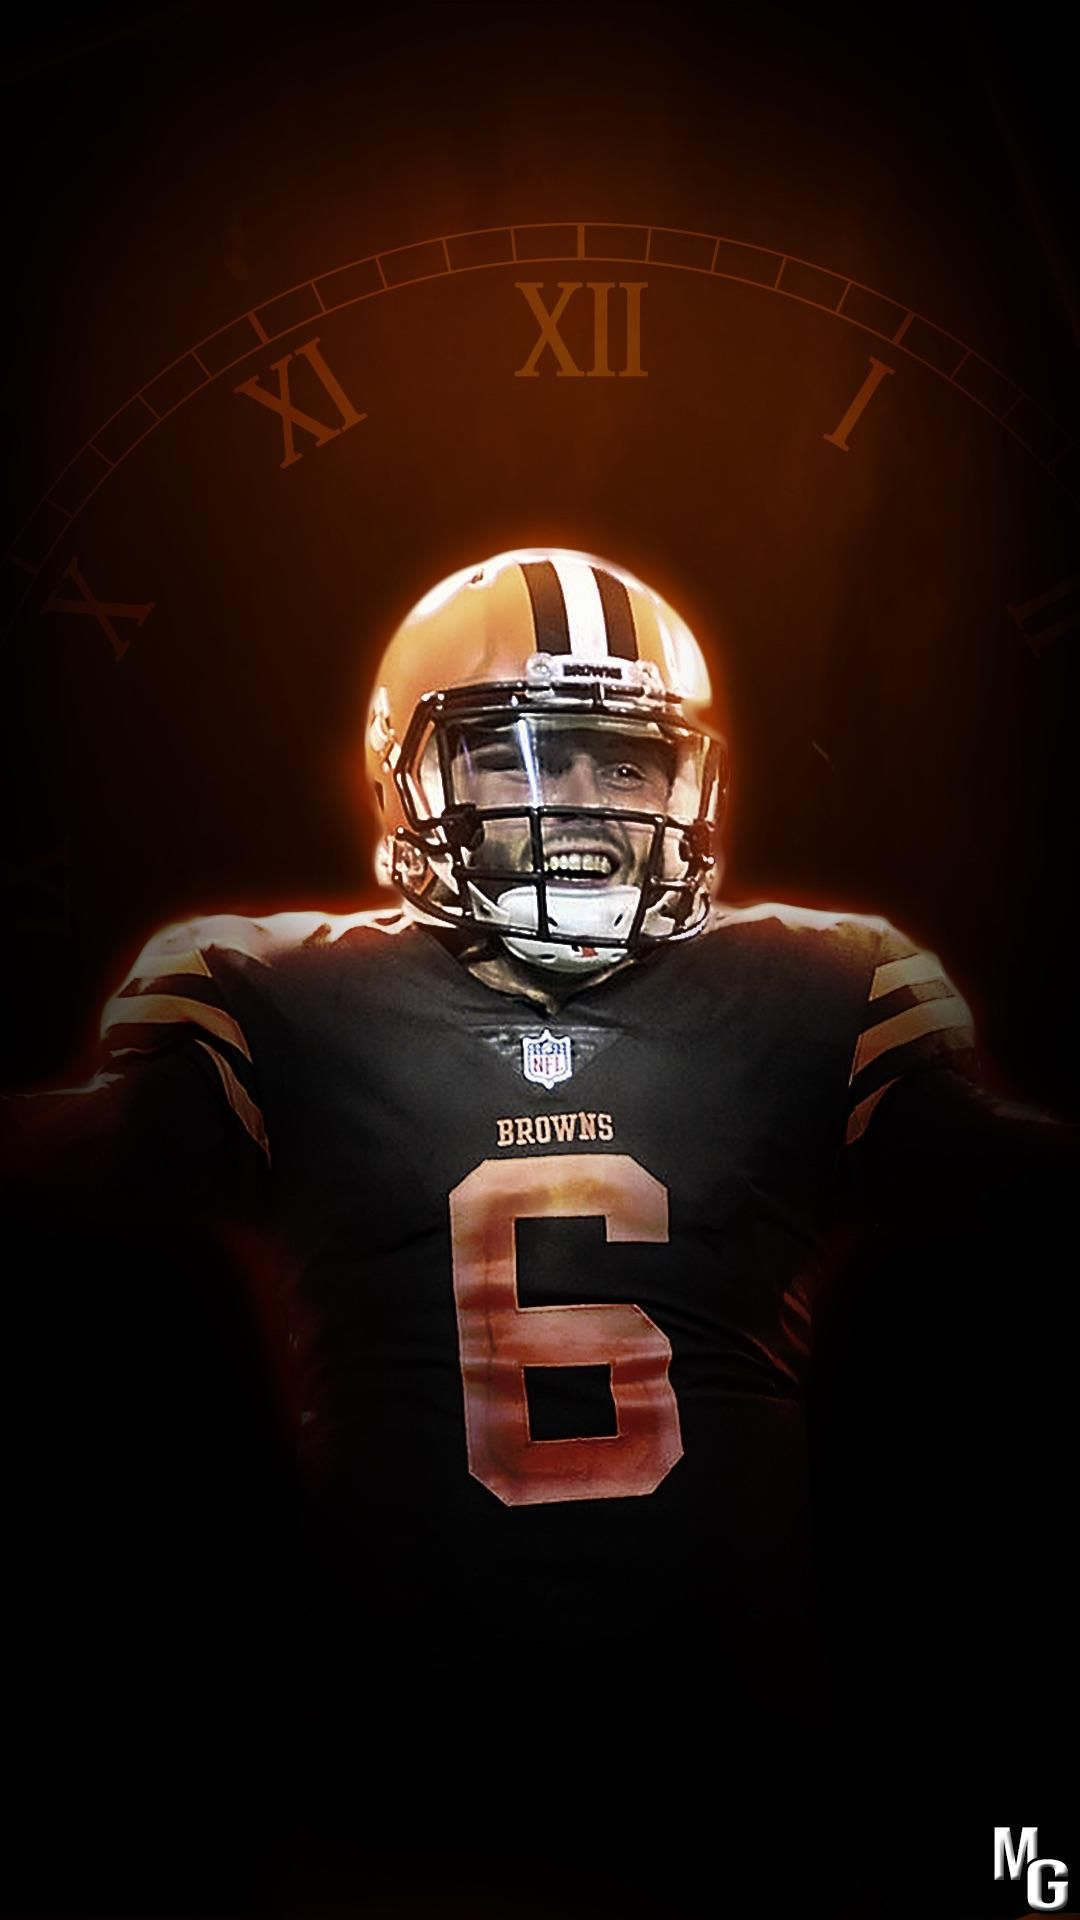 Lamar Jackson Iphone Background In 2020 Football Images Lamar Jackson Football